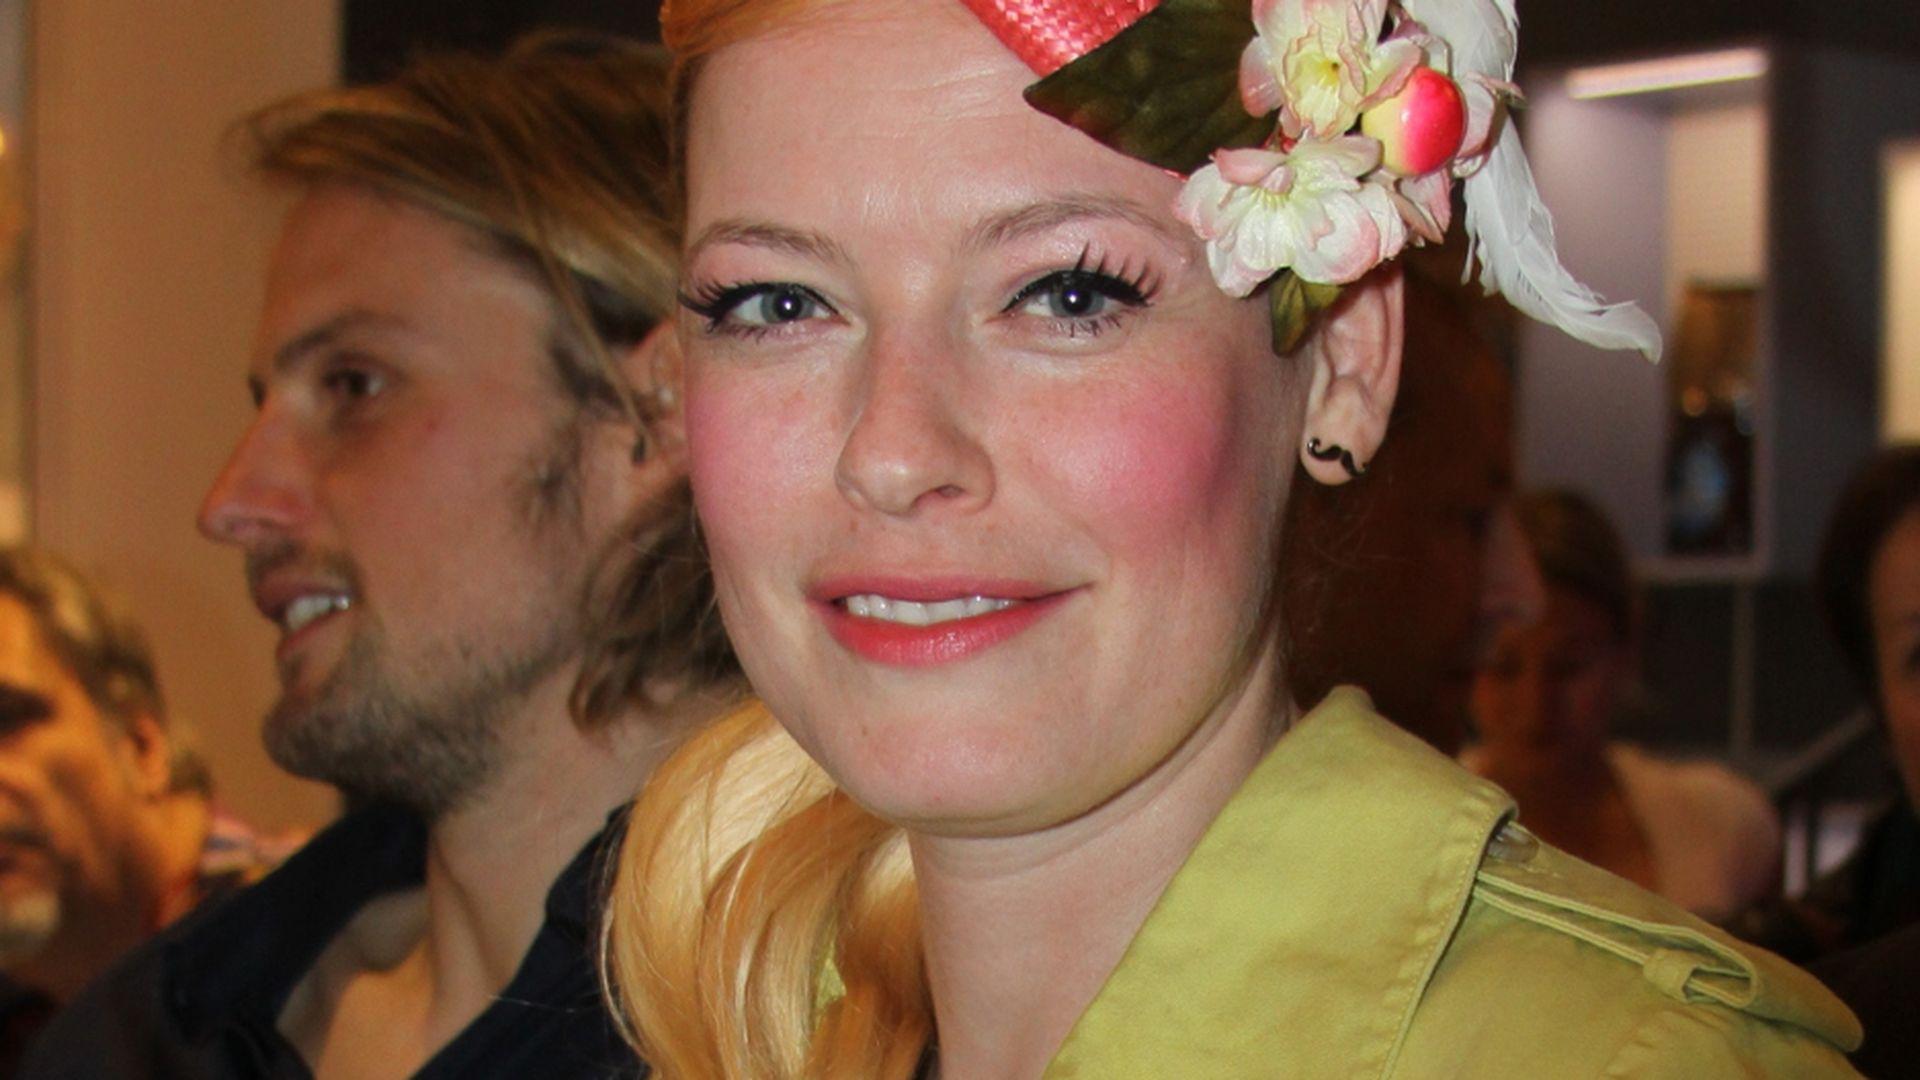 Enie Van De Meiklokjes Kind : enie van de meiklokjes 39 kind d rfte nicht zu dsds ~ Eleganceandgraceweddings.com Haus und Dekorationen